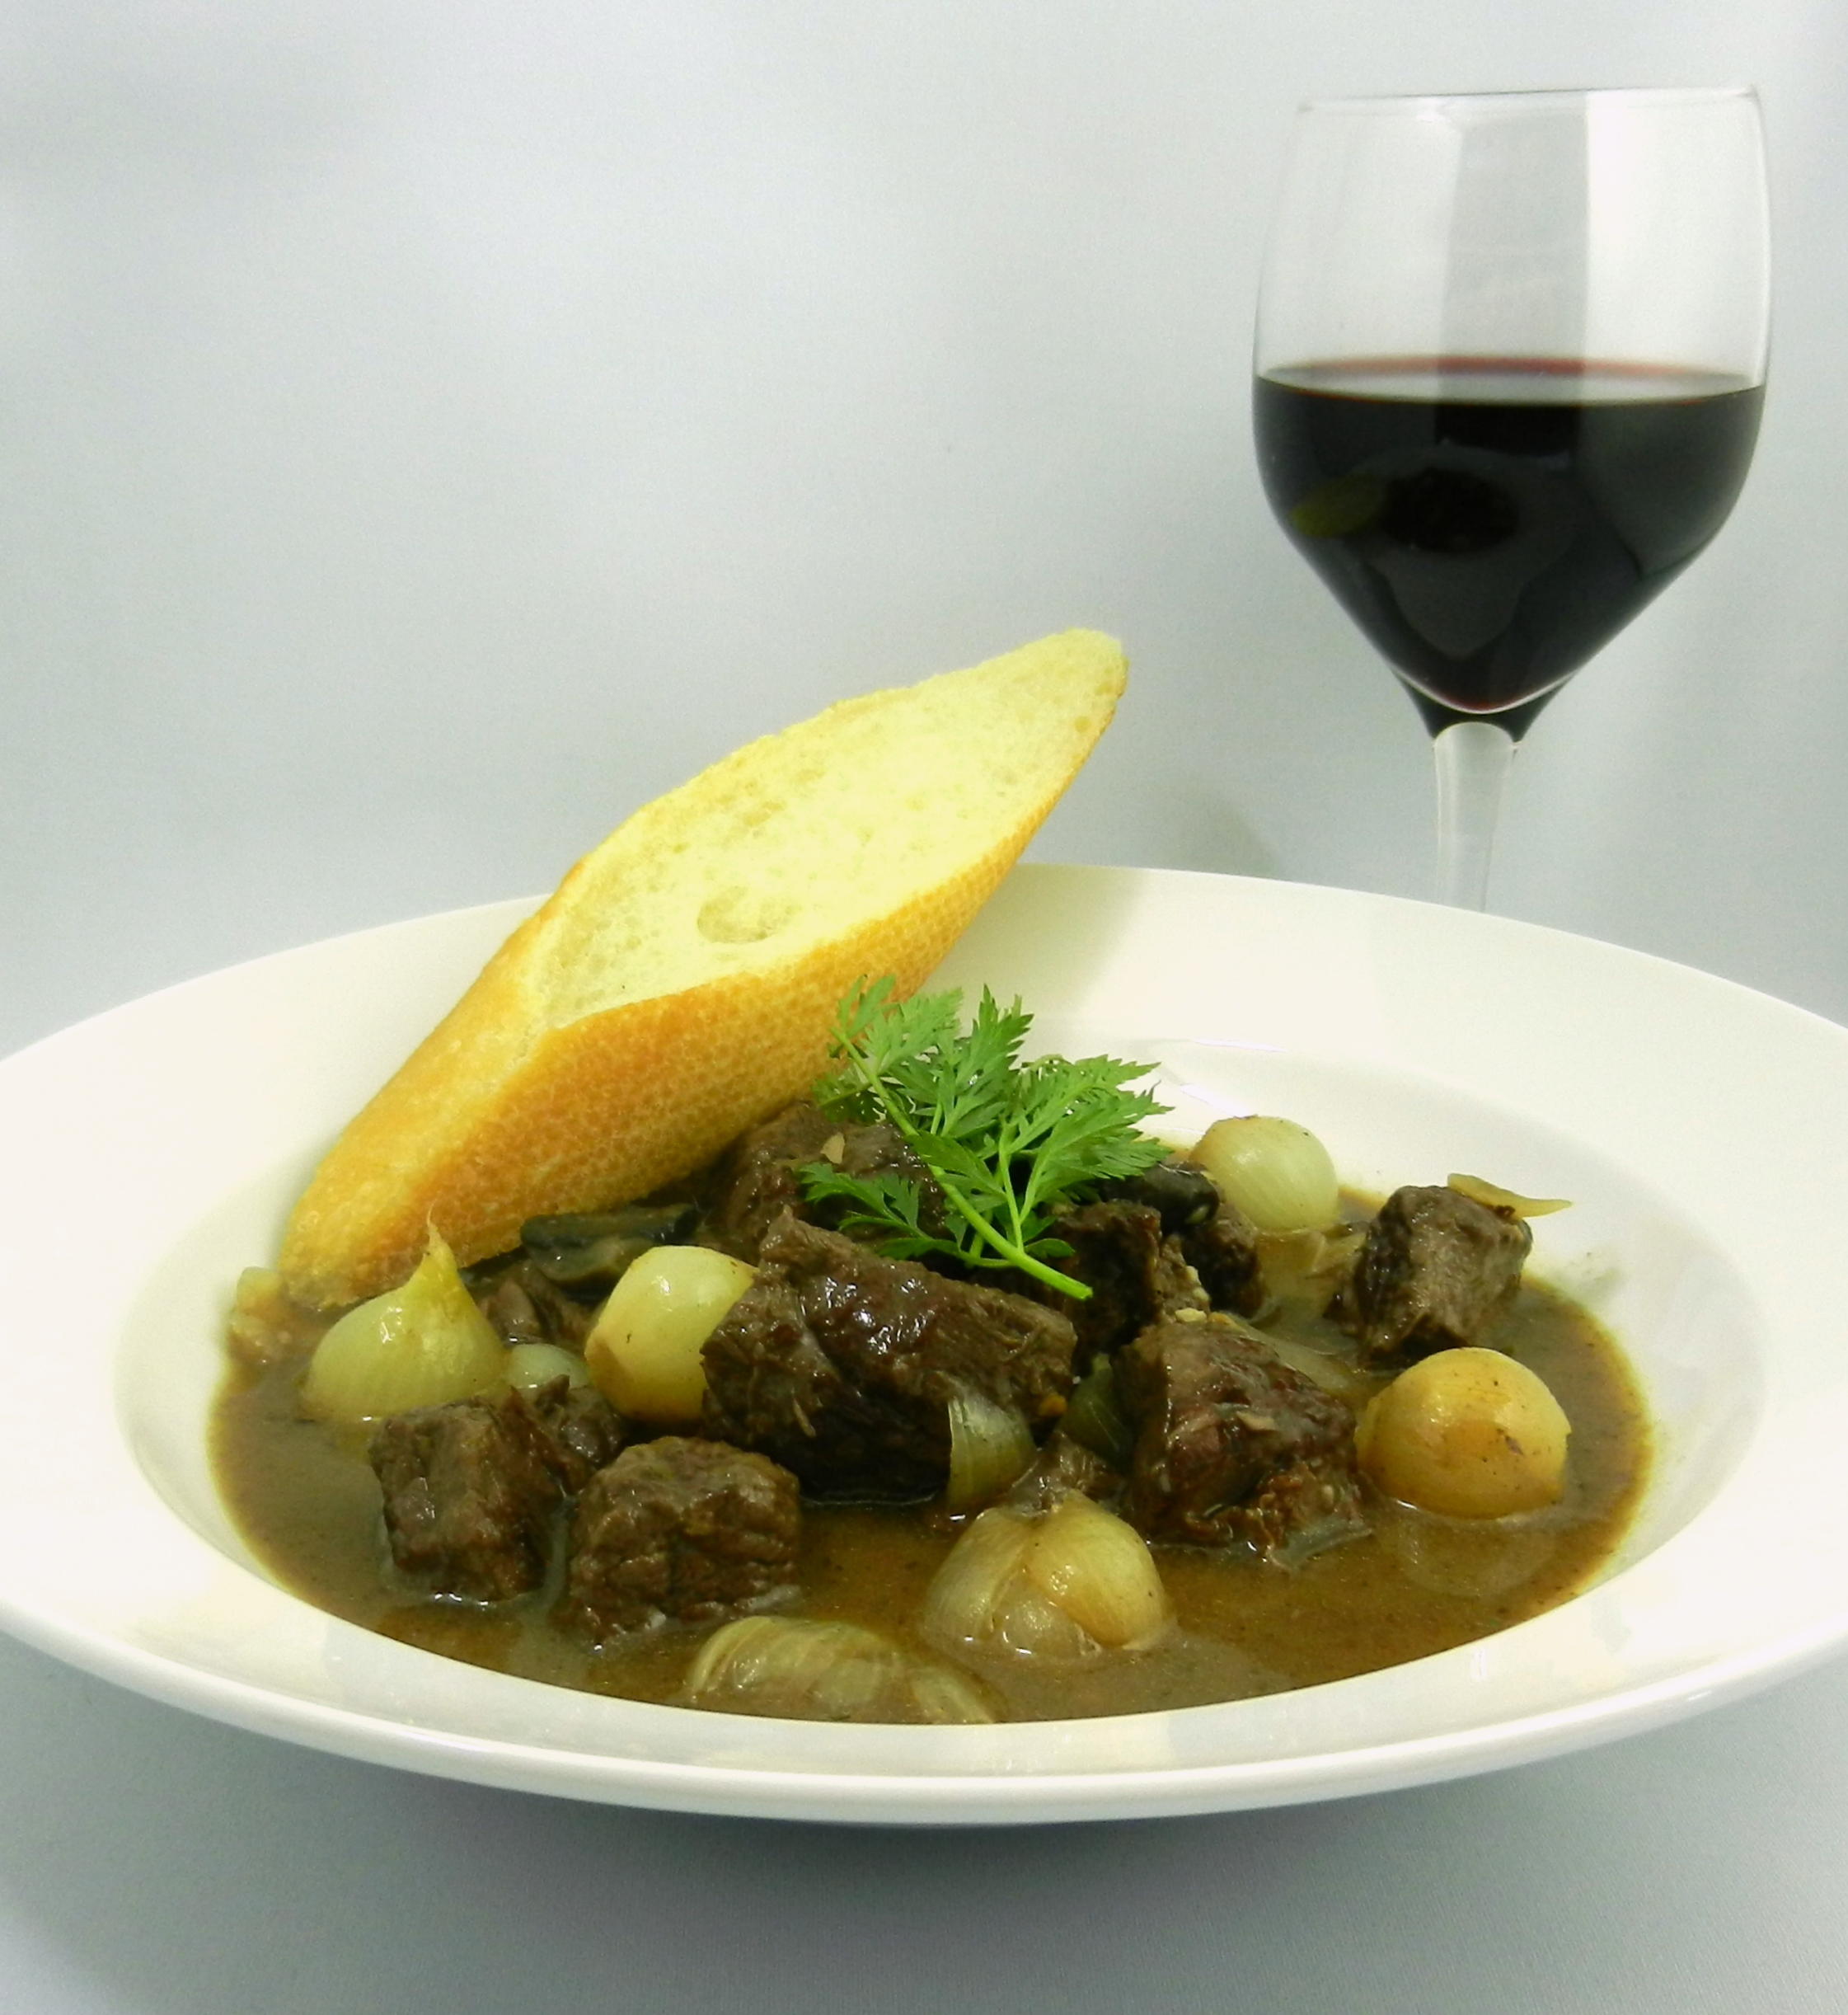 Joy of cooking beef bourguignon